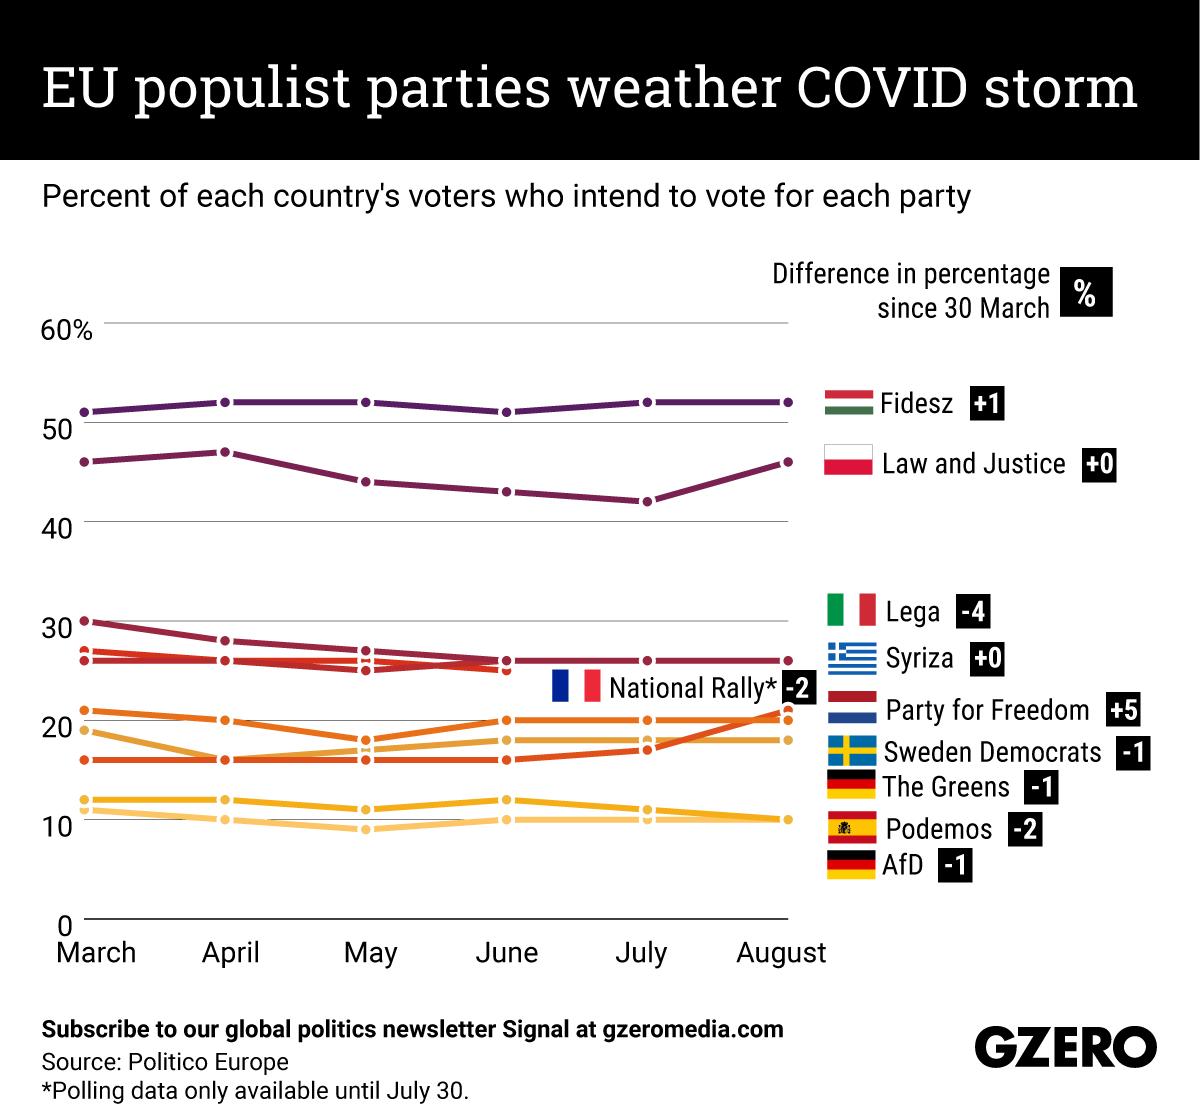 EU populist parties weather COVID storm